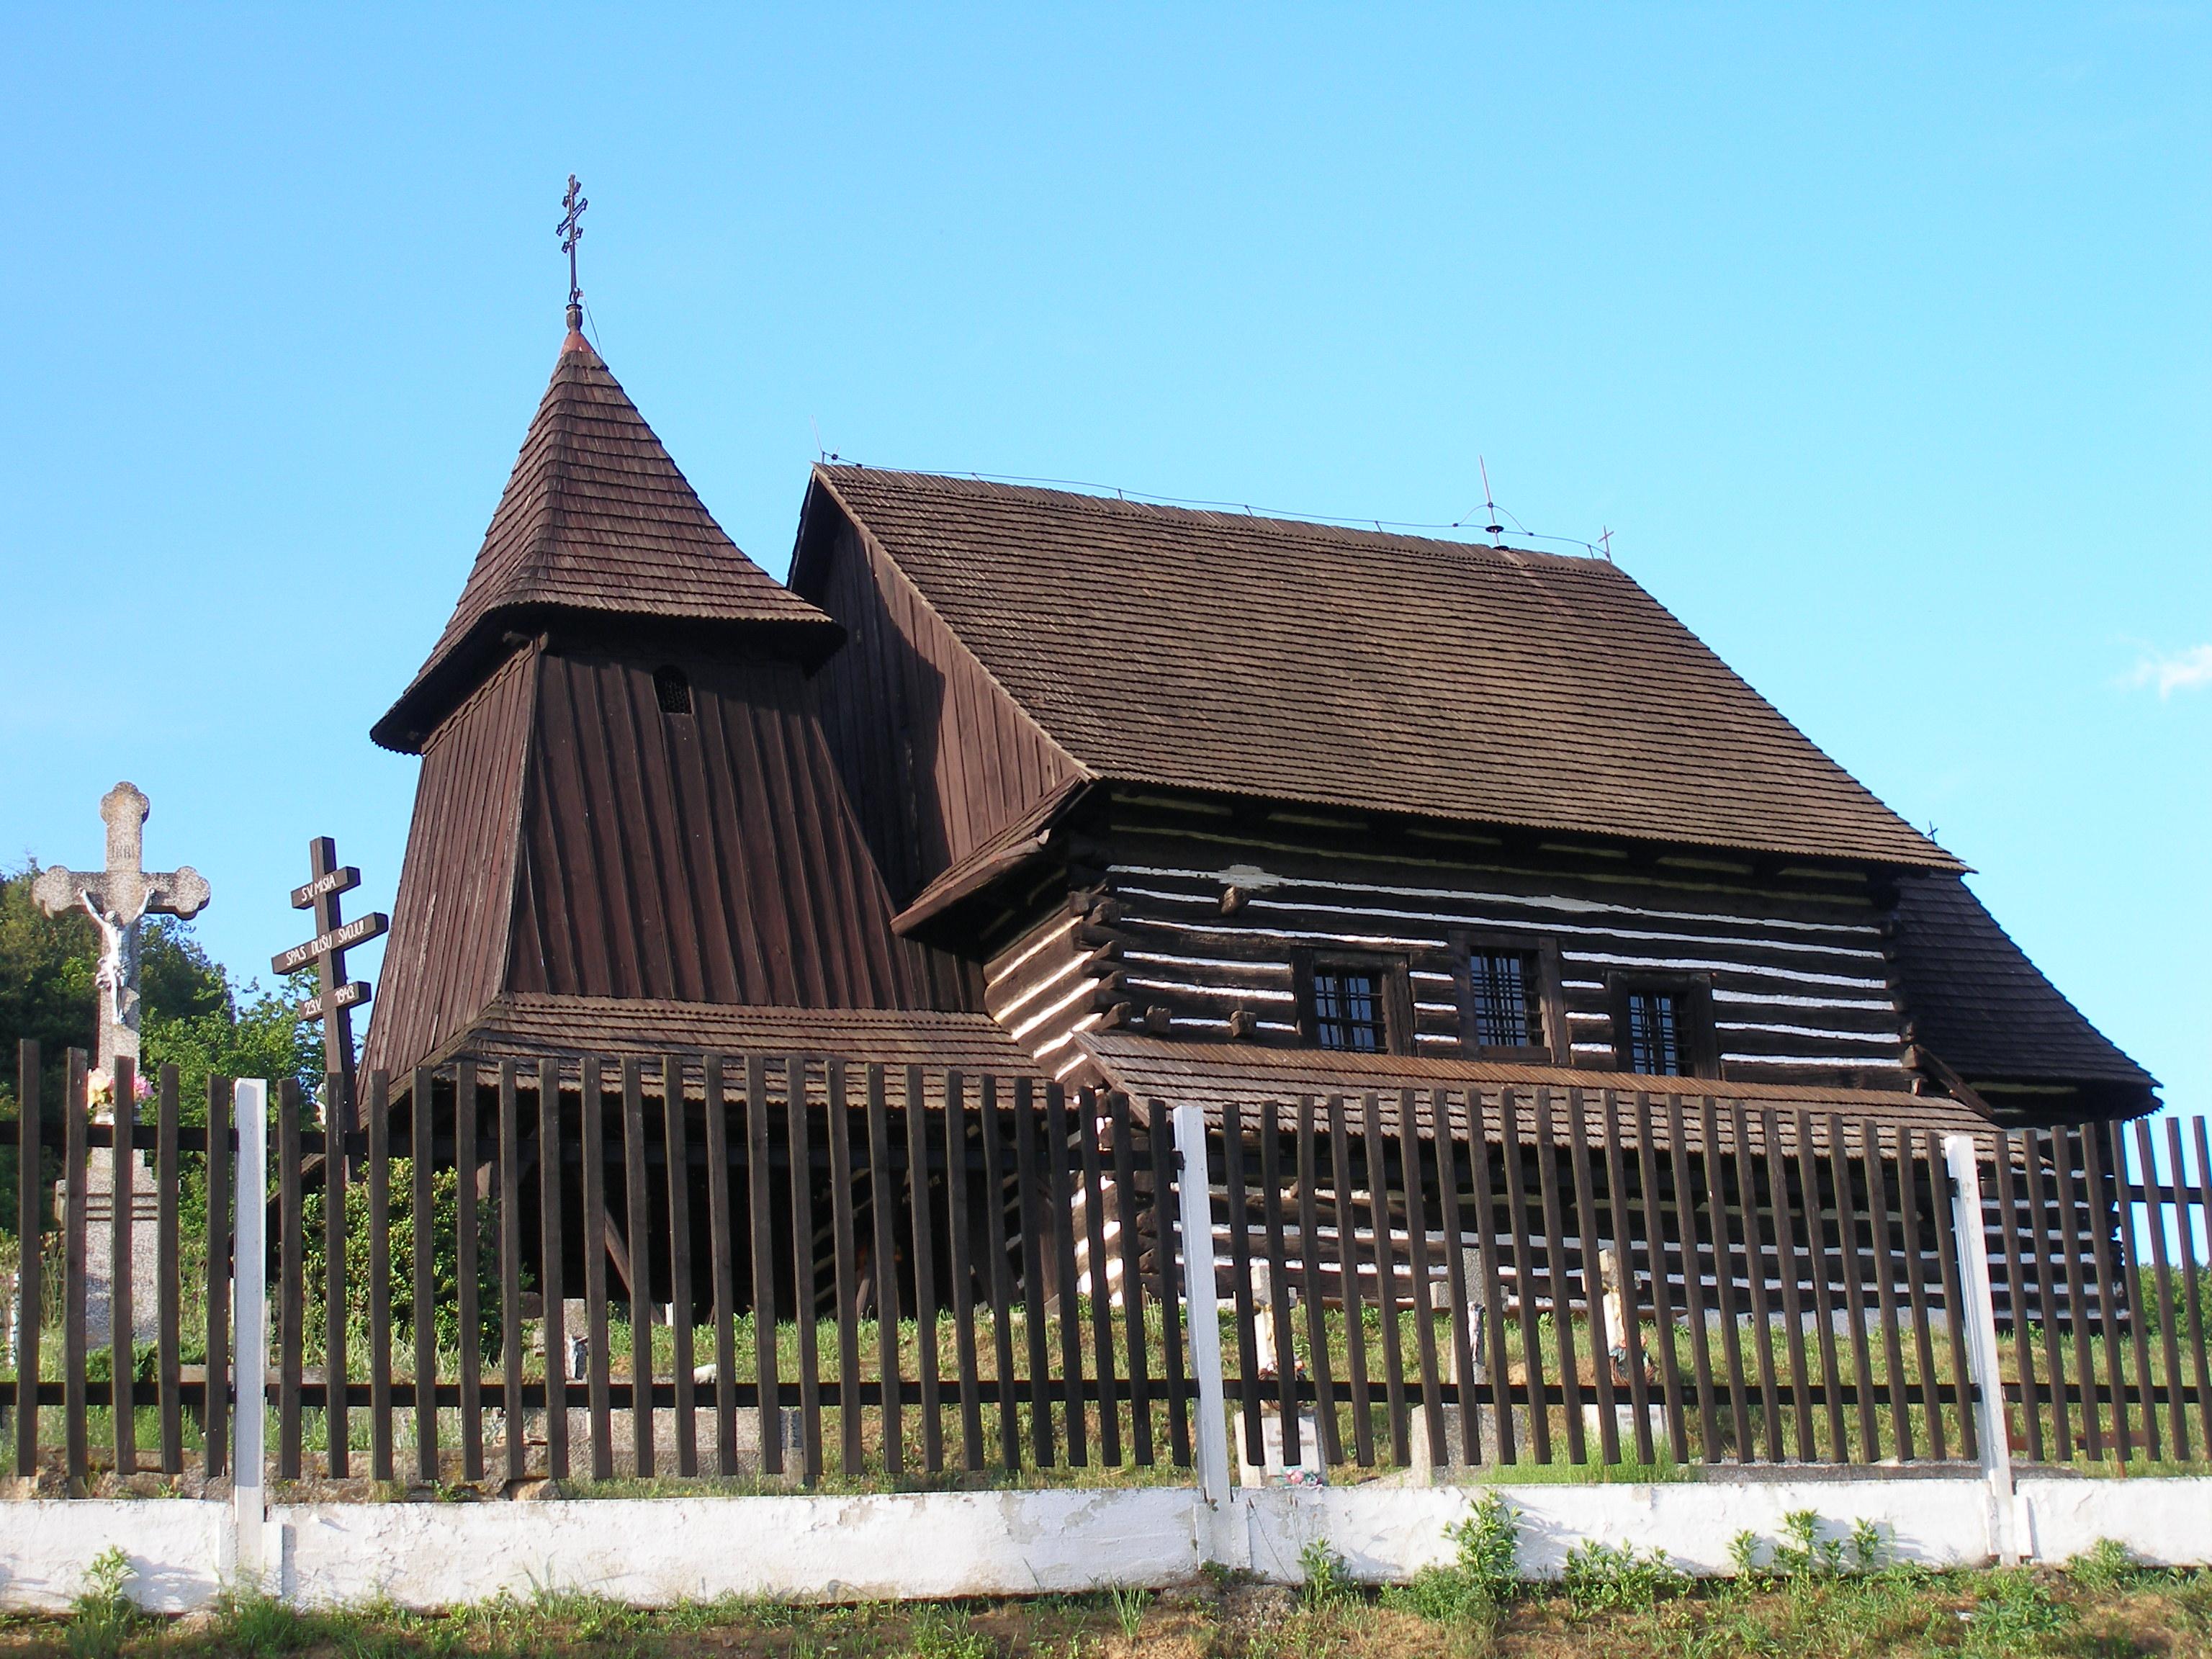 "[lnk url=""https://sk.wikipedia.org/wiki/Bre%C5%BEany#/media/File:Slovakia_folk_art_Brezany_12.jpg""]Zdroj: Wikipedia CC 2.0, Autor: Jozef Kotulič[/lnk]"